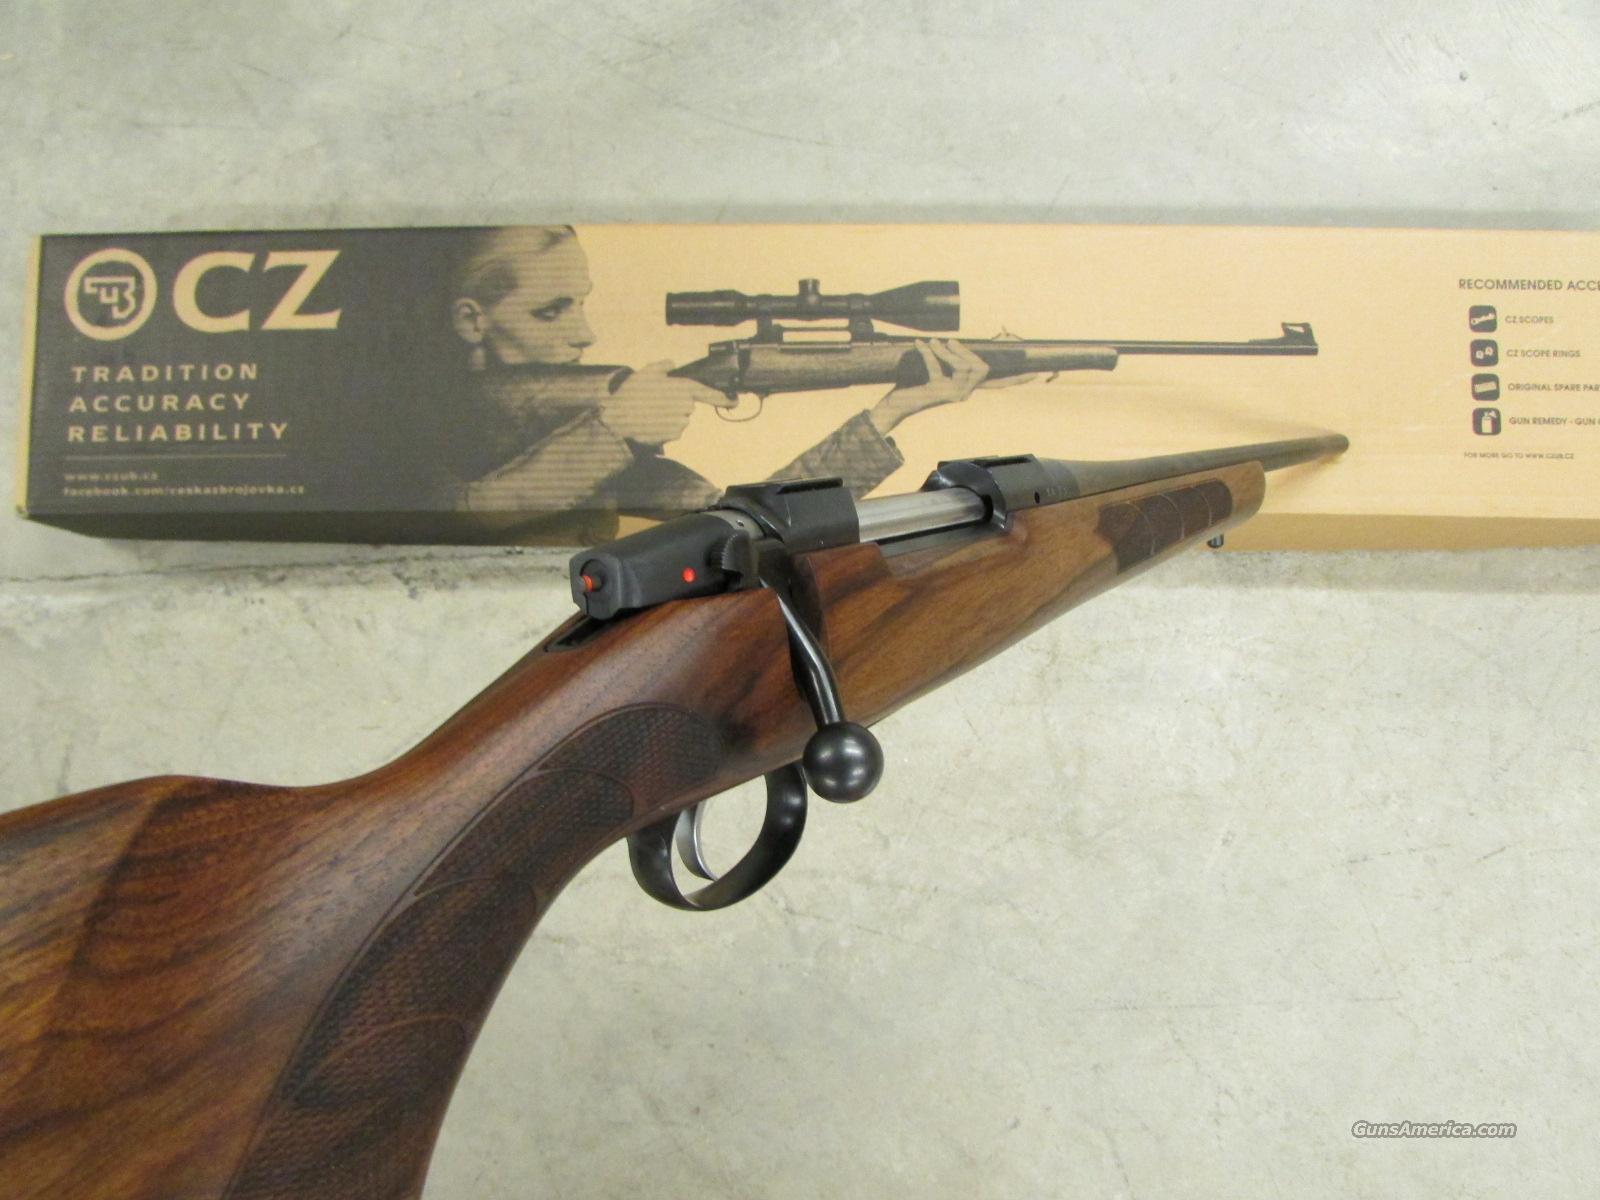 Big-Game Classic: CZ 557 Sporter Review - Guns & Ammo